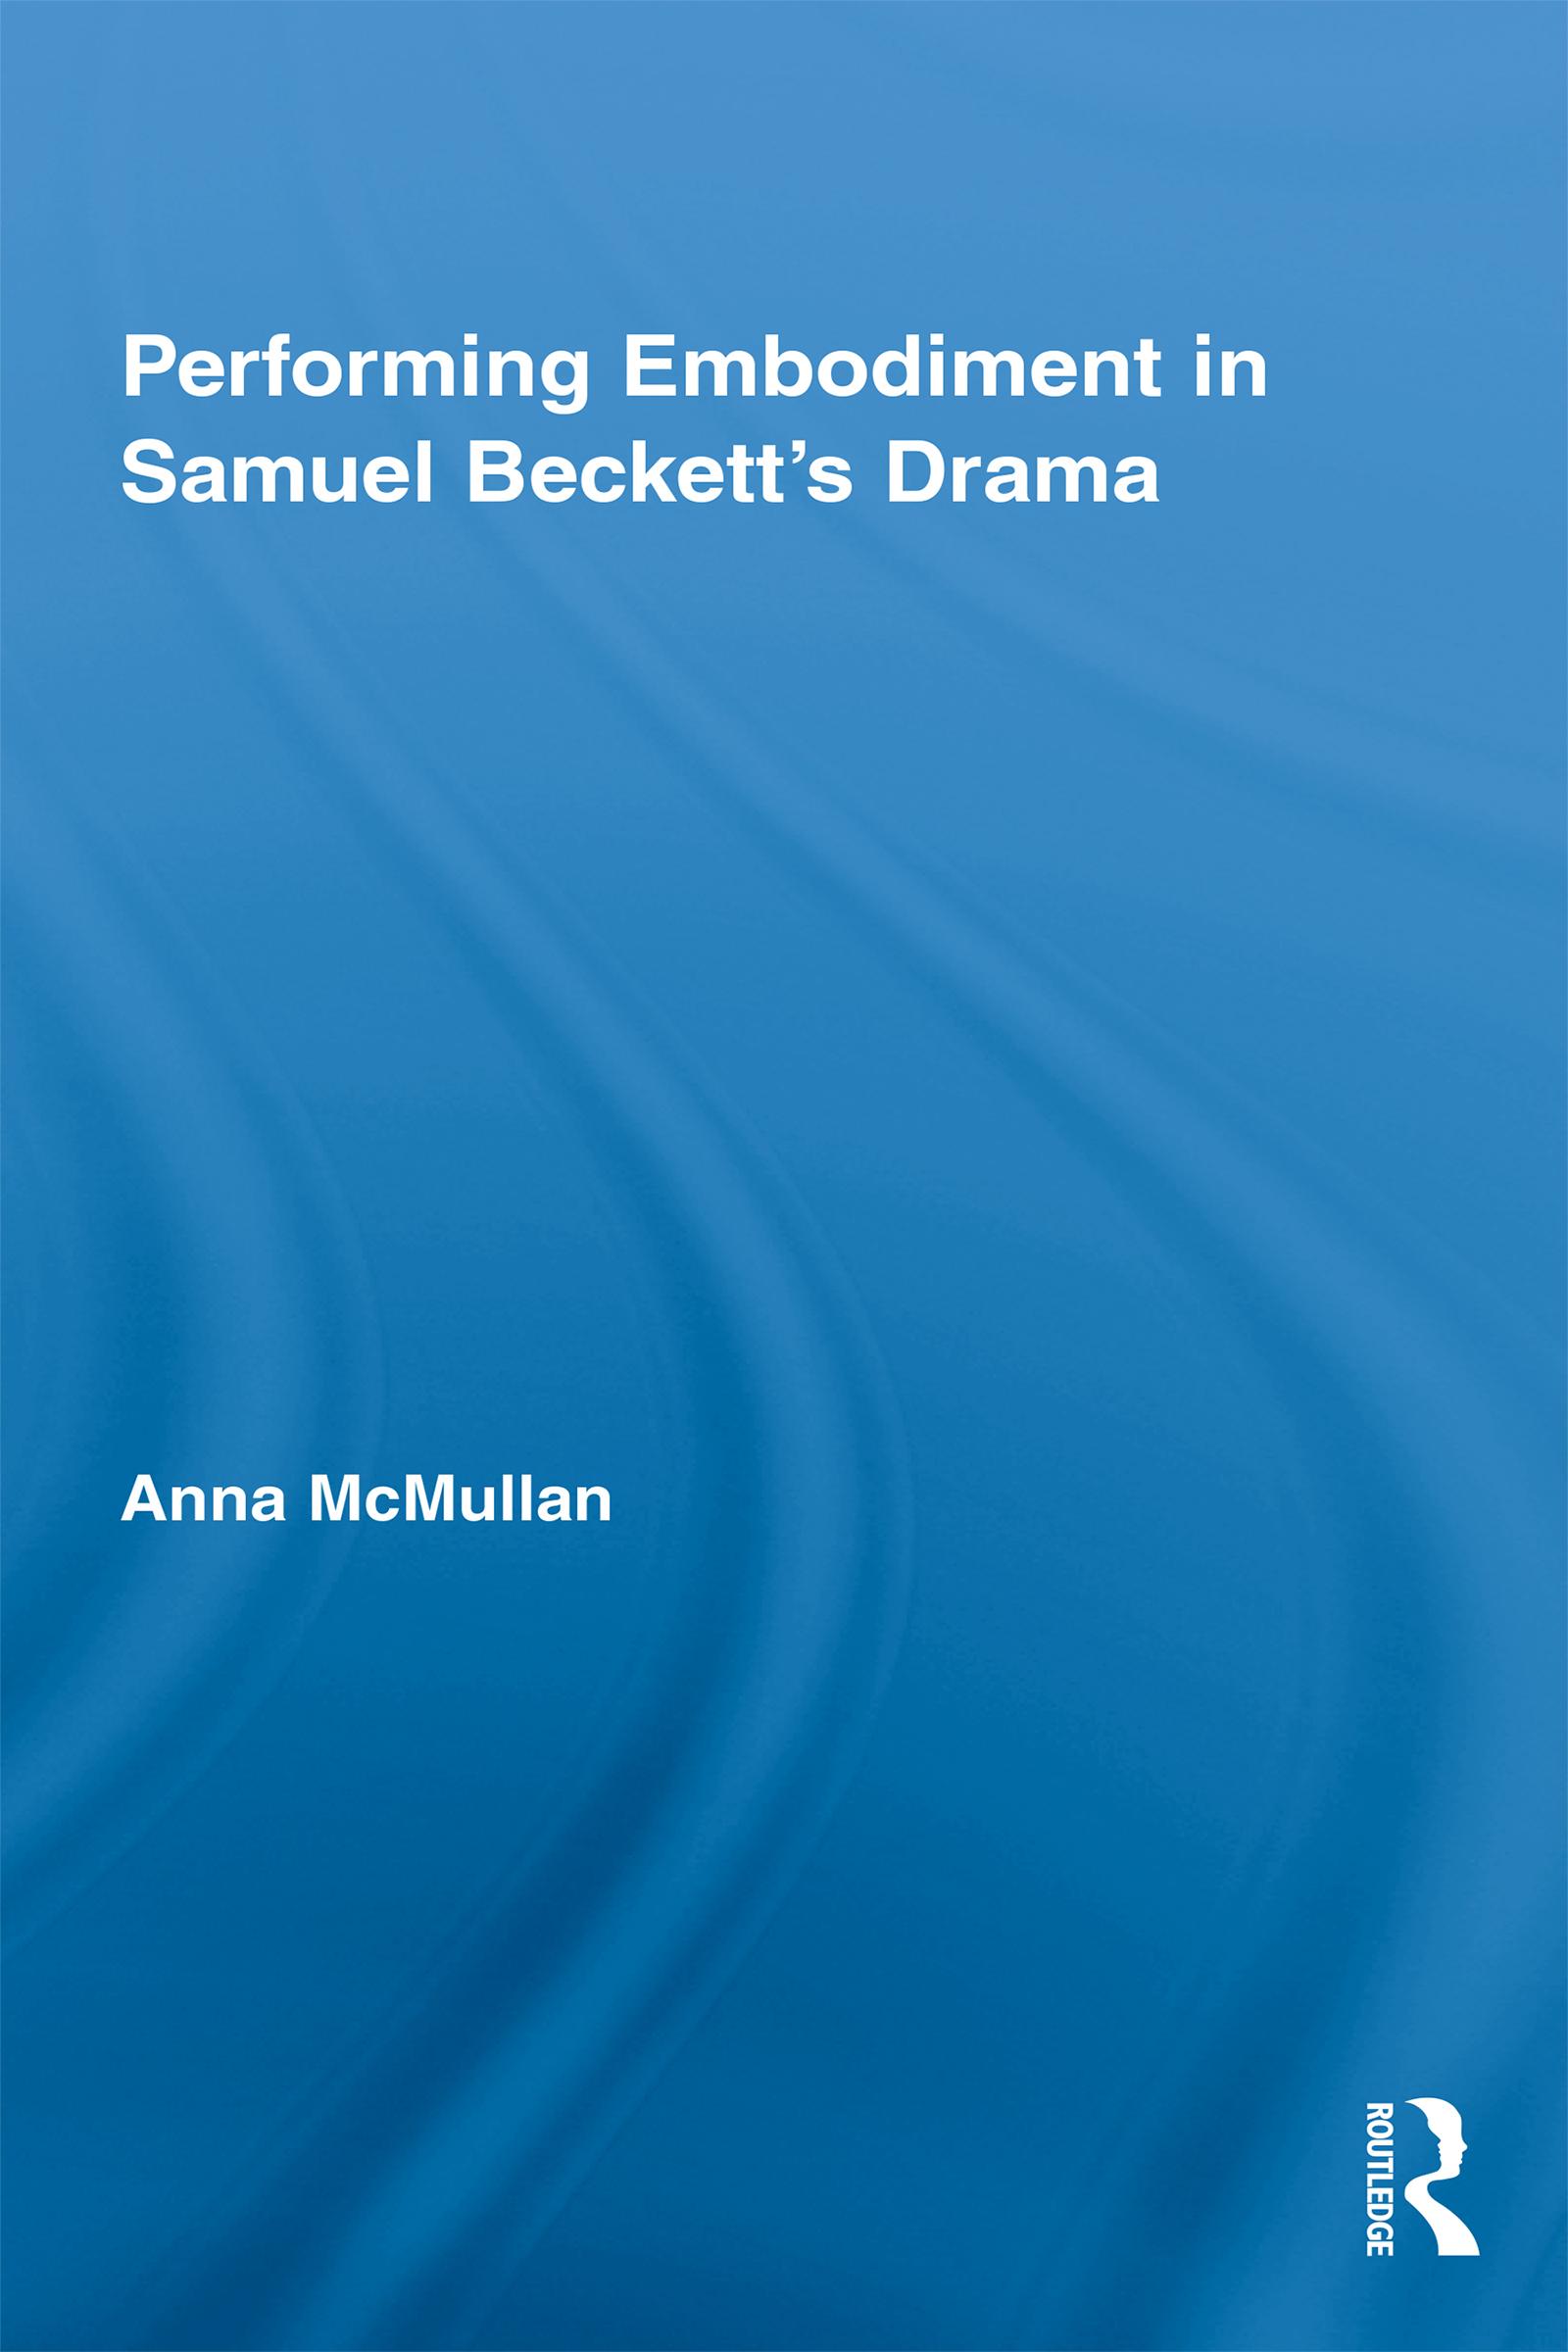 Performing Embodiment in Samuel Beckett's Drama